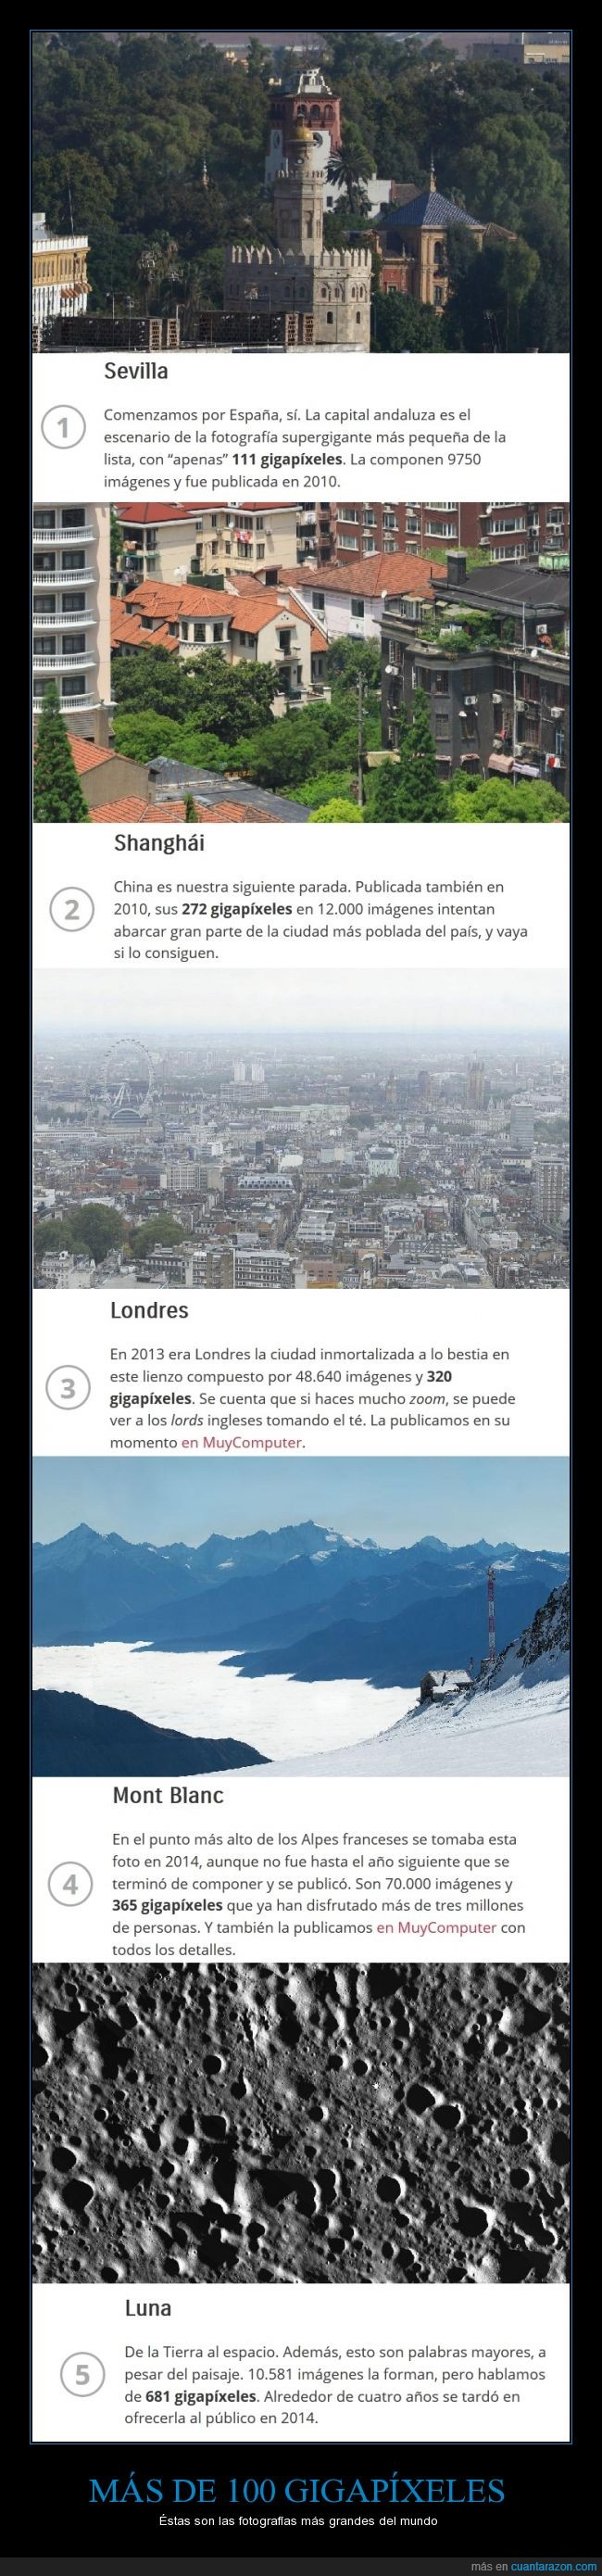 100,fotografiás,gigapíxeles,grande,Londres,luna,Mont Blanc,Sevilla,Shanghái,sorprendente